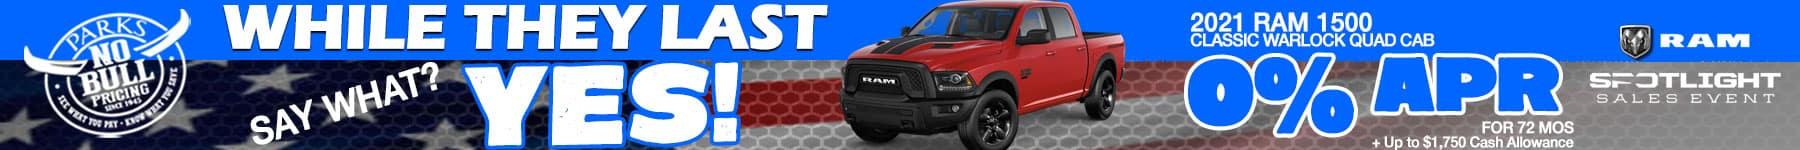 PARKS-MAY-RAM1500-PENCIL